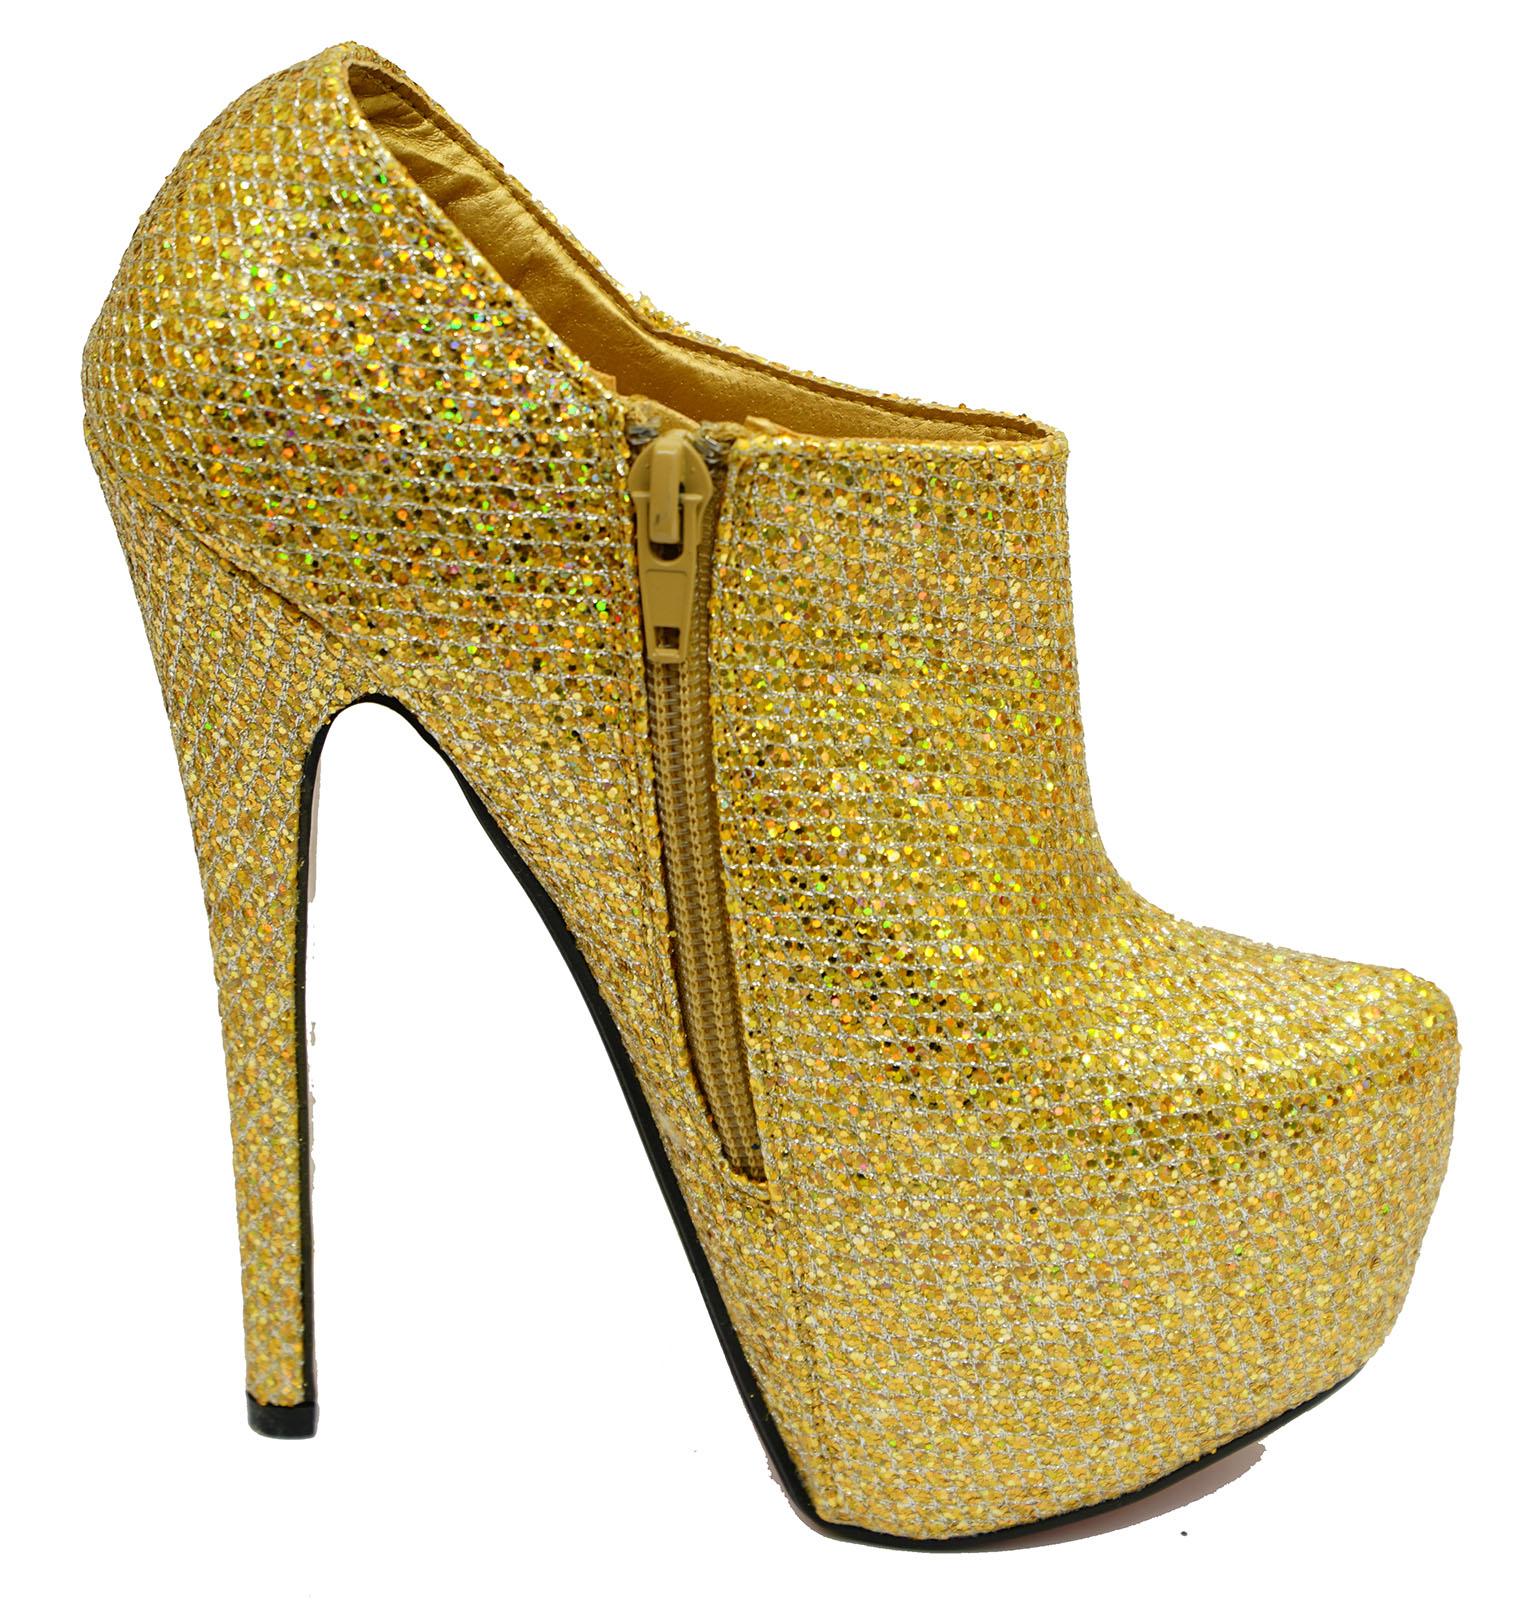 LADIES GOLD PLATFORM HIGH HEEL CHELSEA ANKLE ZIP-UP BOOTS EVENING SHOES UK 3-7